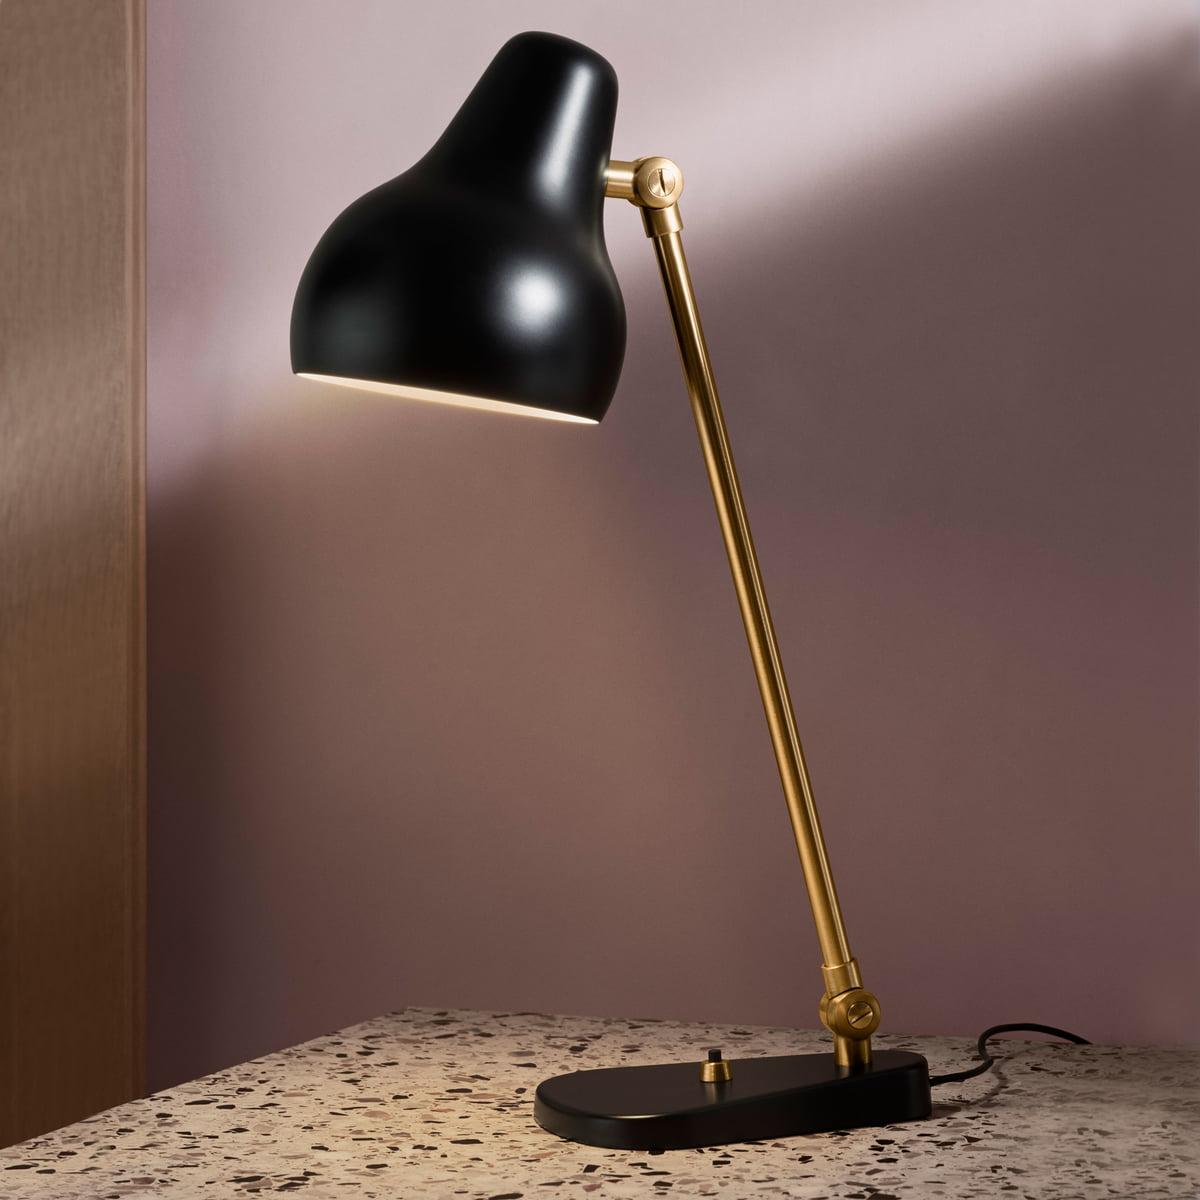 Shop for the vl38 table lamp by louis poulsen vl38 led series by louis poulsen vl38 led table lamp aloadofball Choice Image